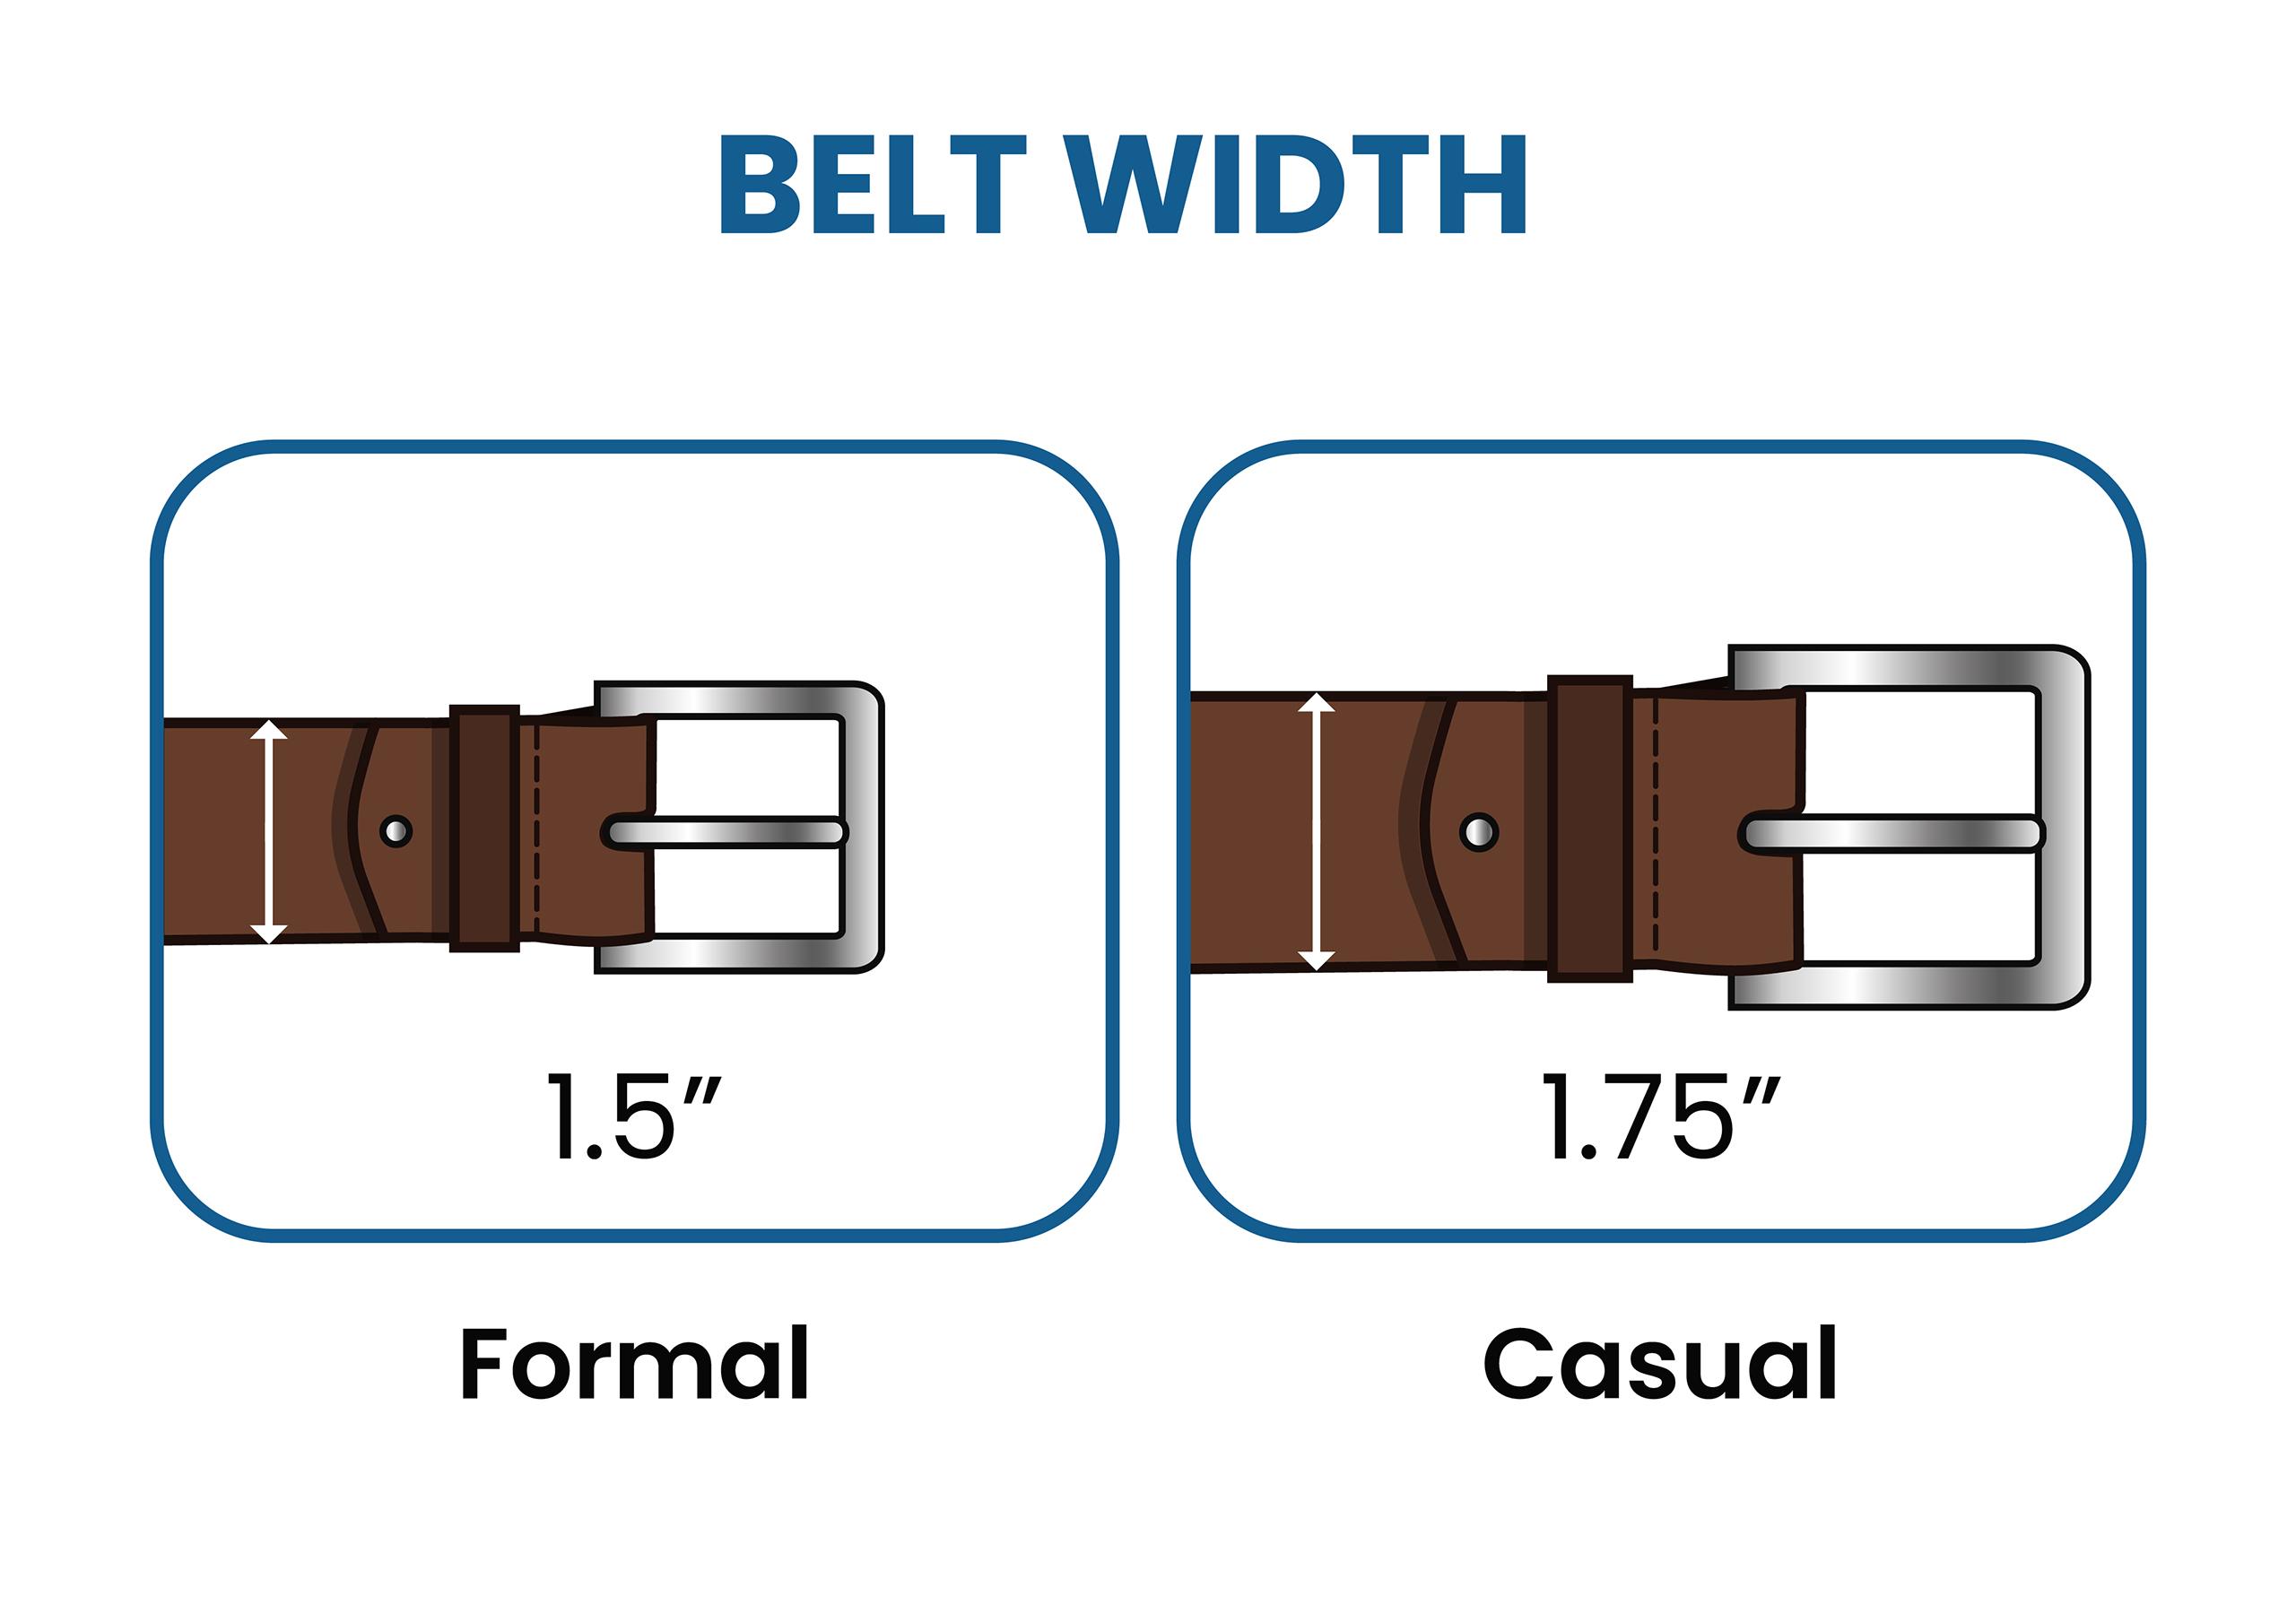 different belt widths: formal vs. casual